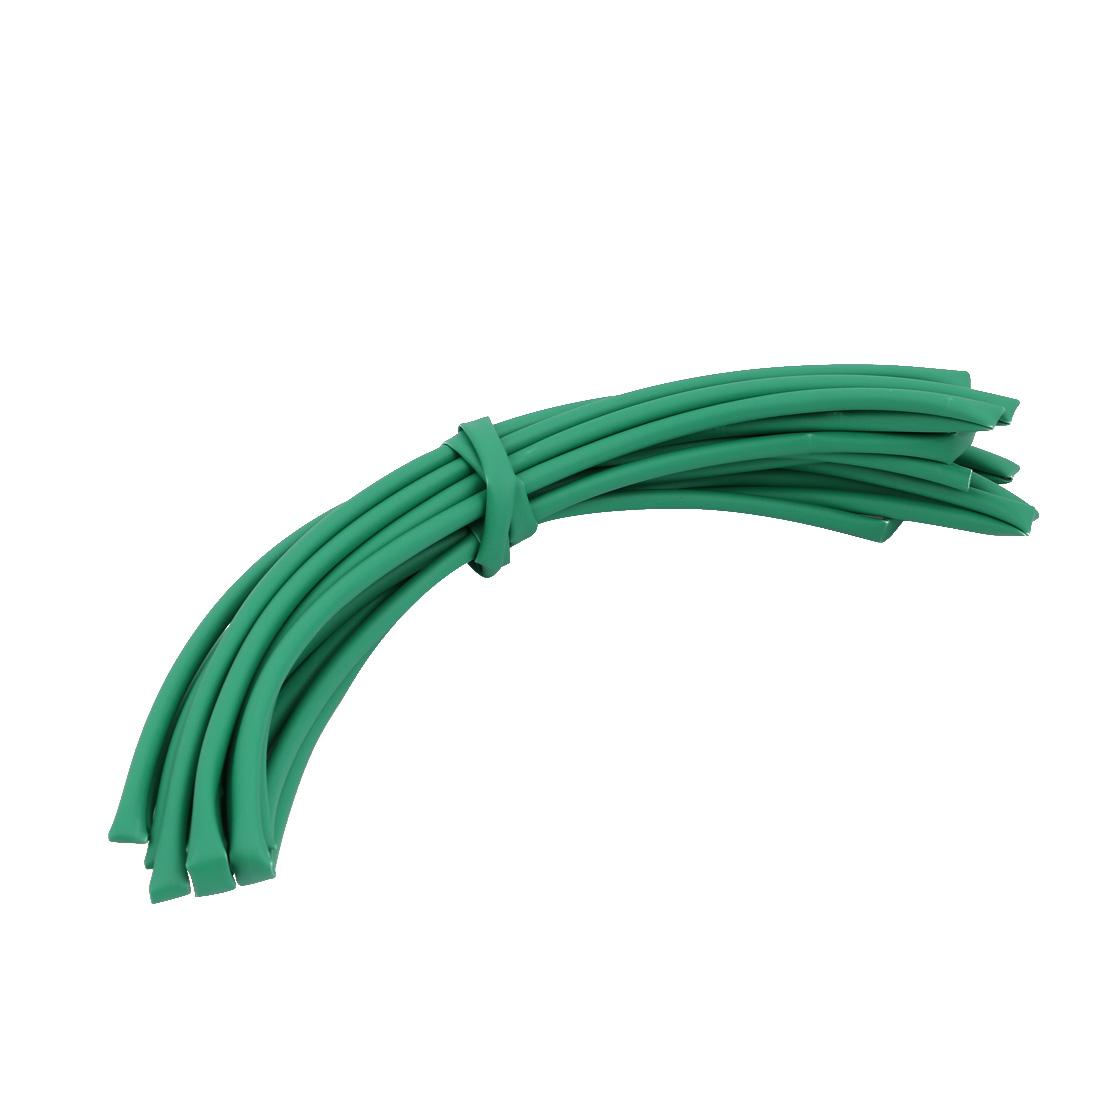 5M 0.18in Inner Dia Polyolefin Flame Retardant Tube Green for Wire Repairing